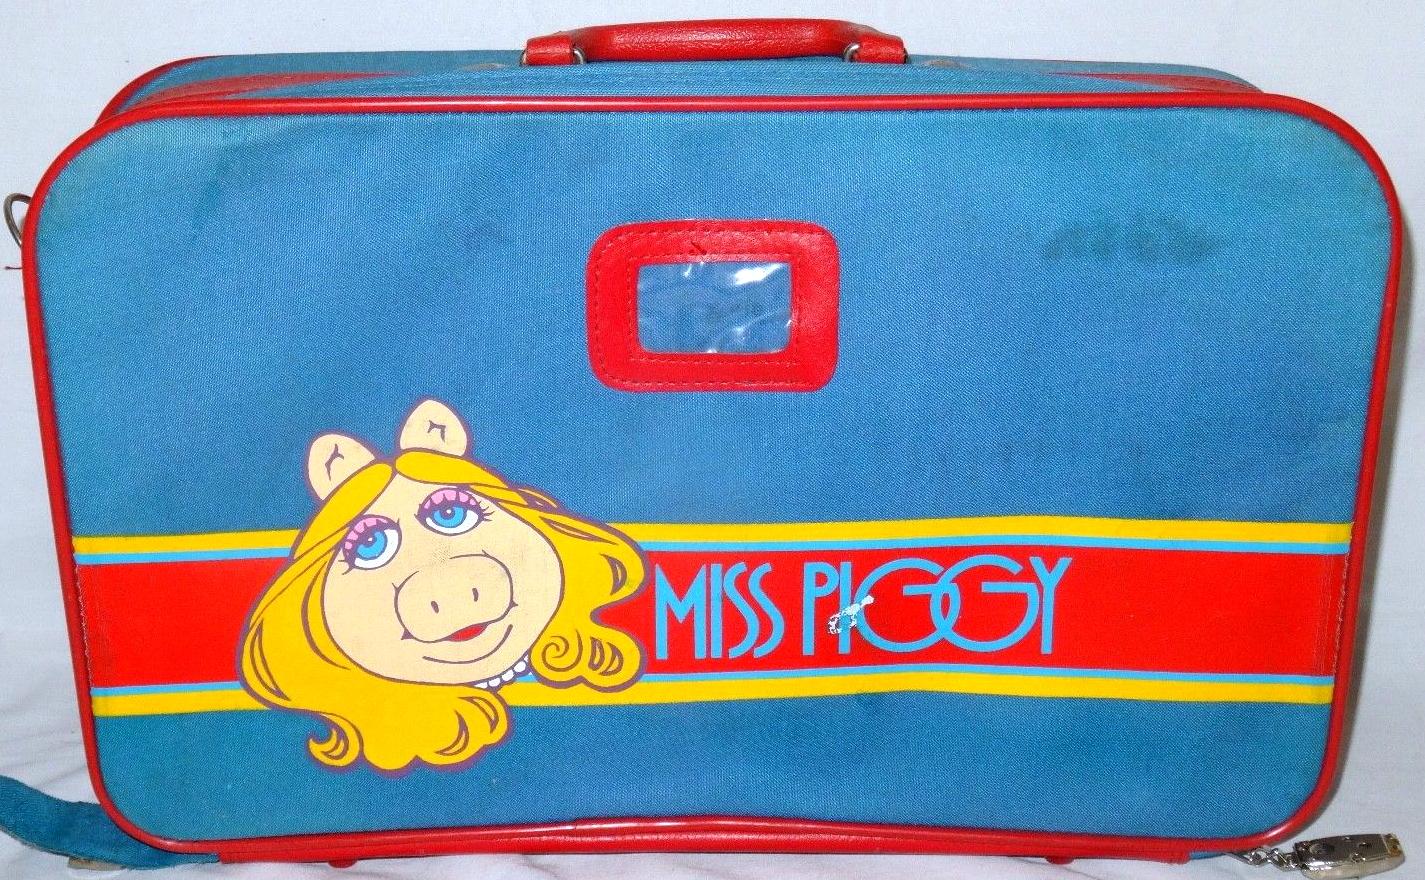 File:Butterfly originals 1981 suitcase set.jpg